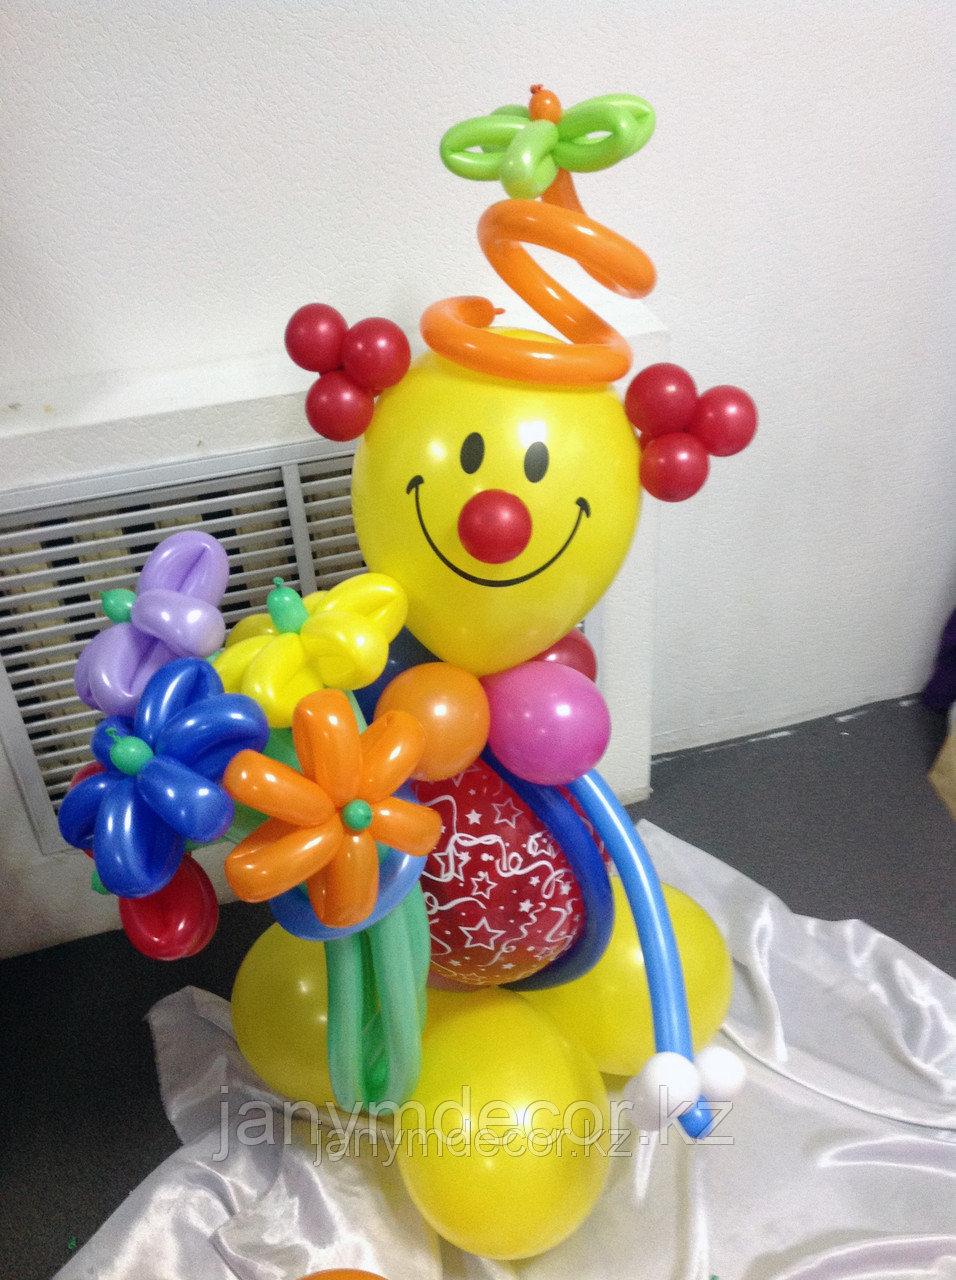 Клоун с букетом к 8 марта - фото 5